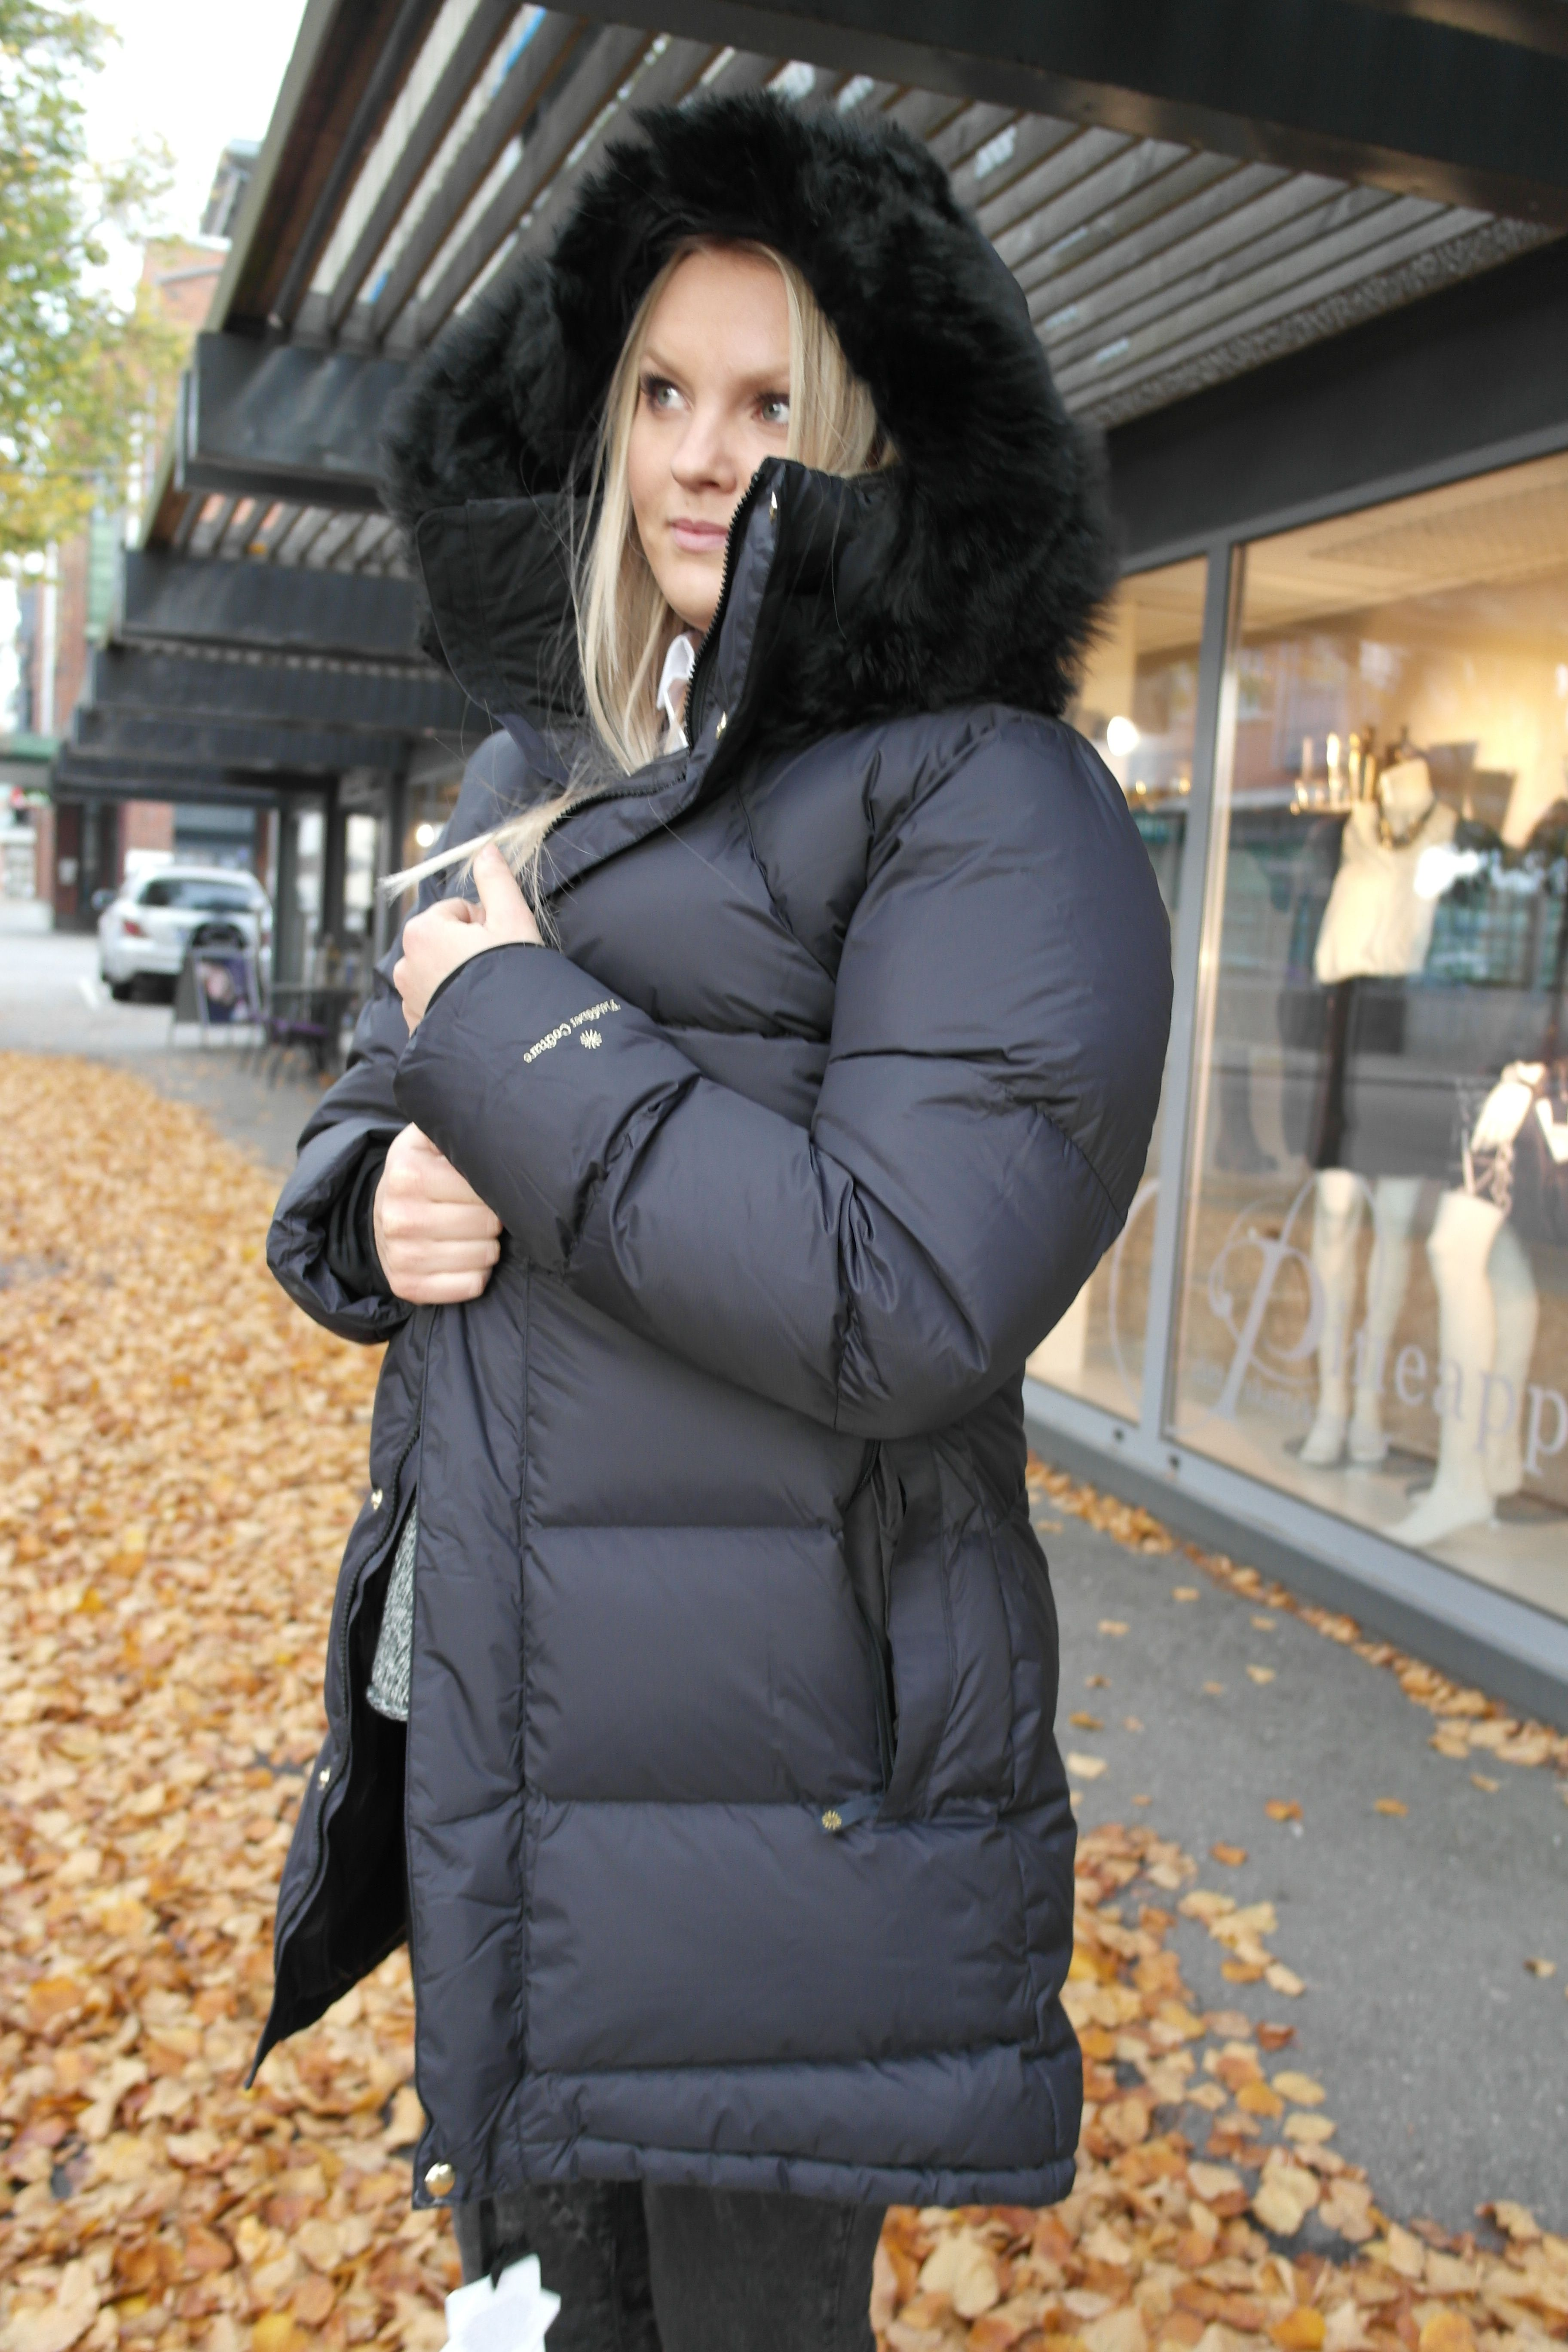 Couture Down Couture Jackets Fleischer Mix Pinterest Jacket YOCdwqx